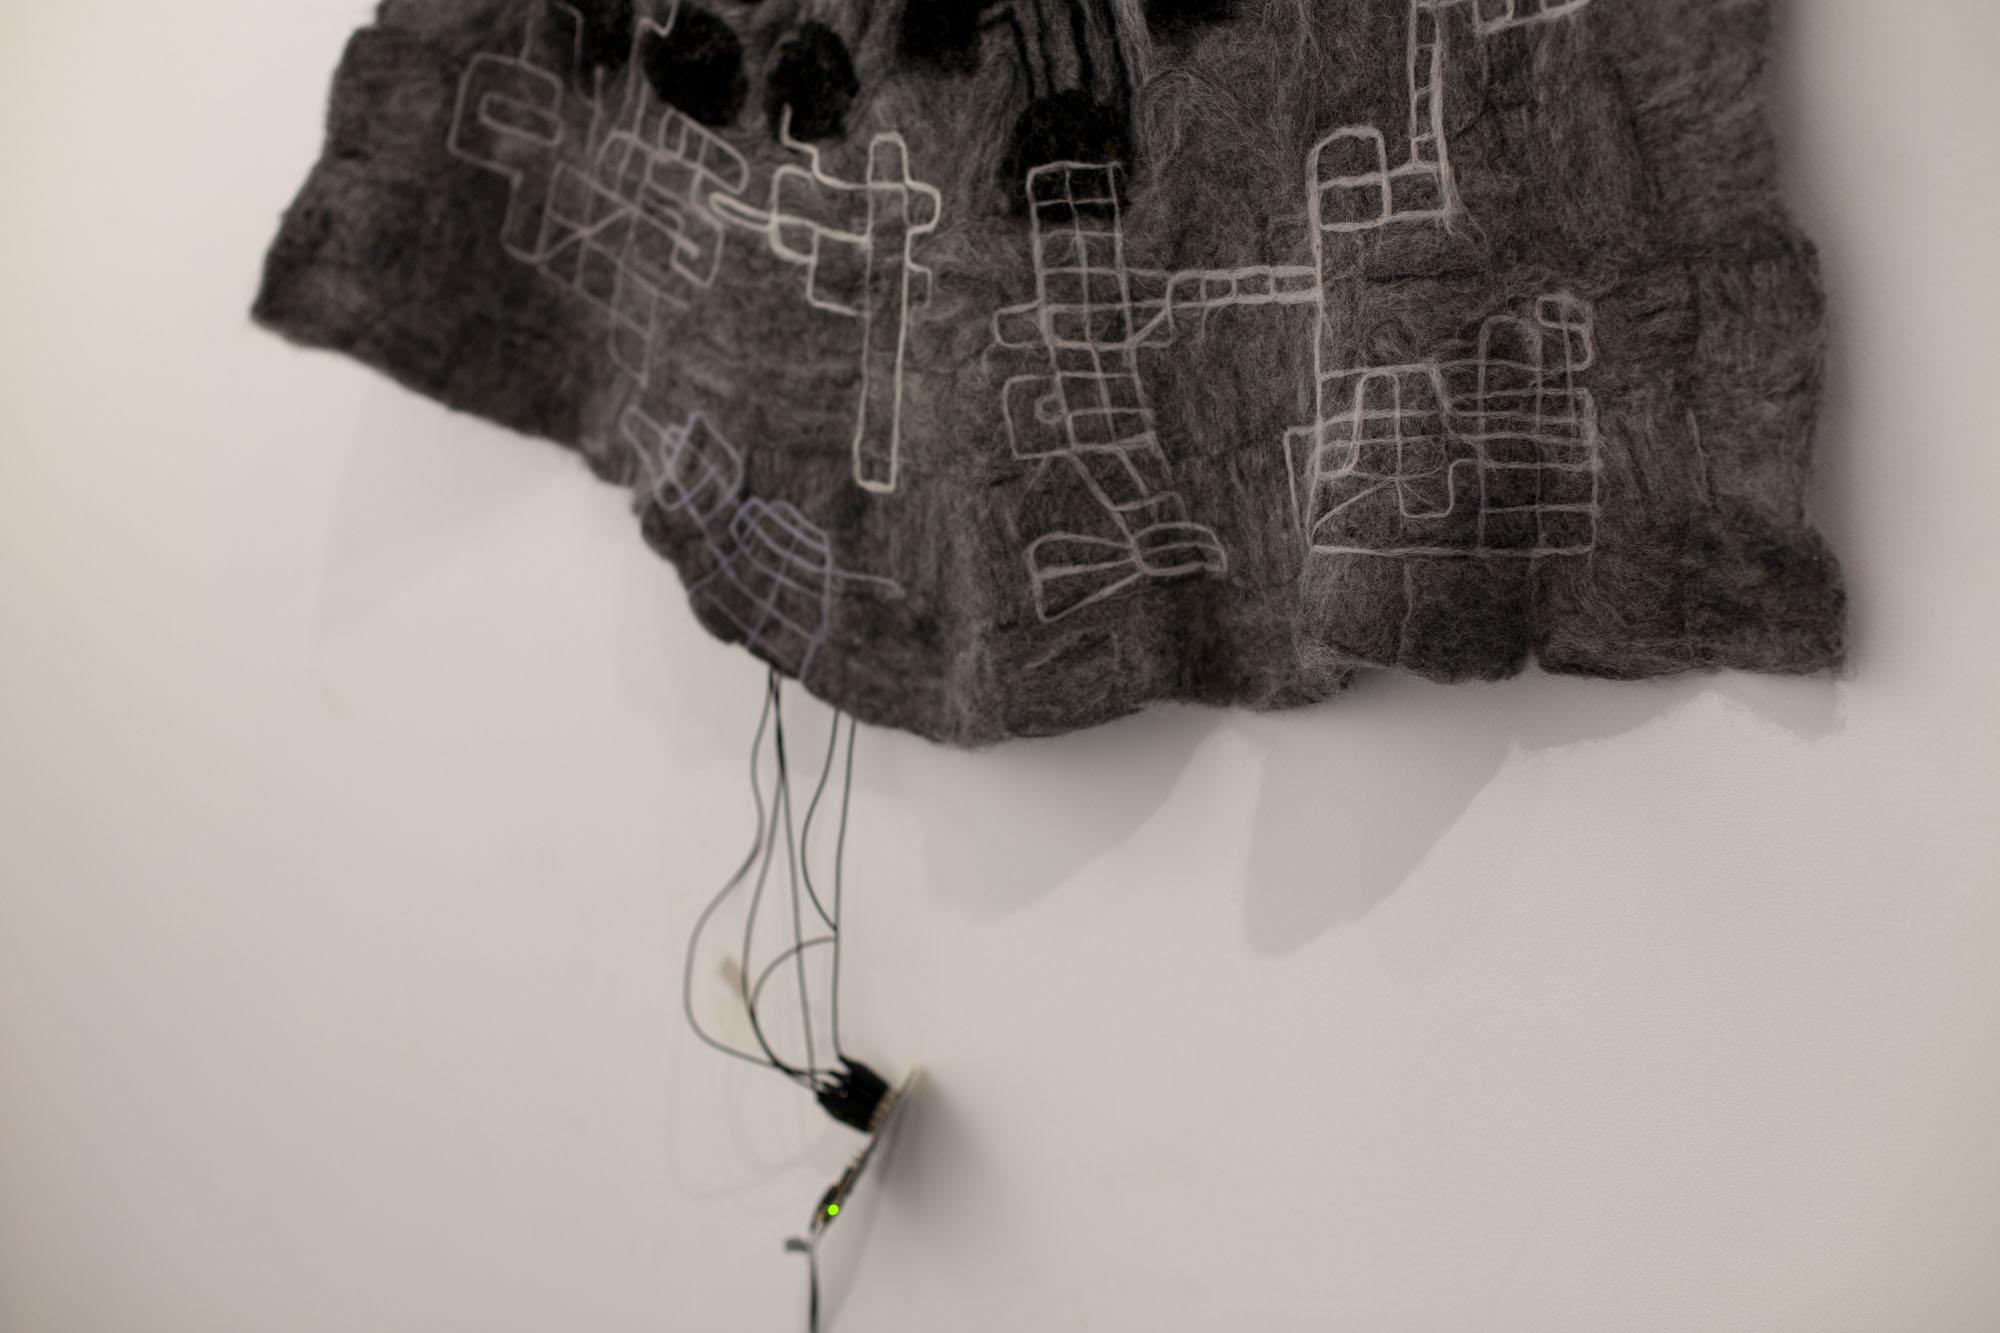 Felt (detail) 2017 | Merino wool, stainless steel fibre, micro controller, speaker | Dimensions variable (felt piece 33 x 74 cm)